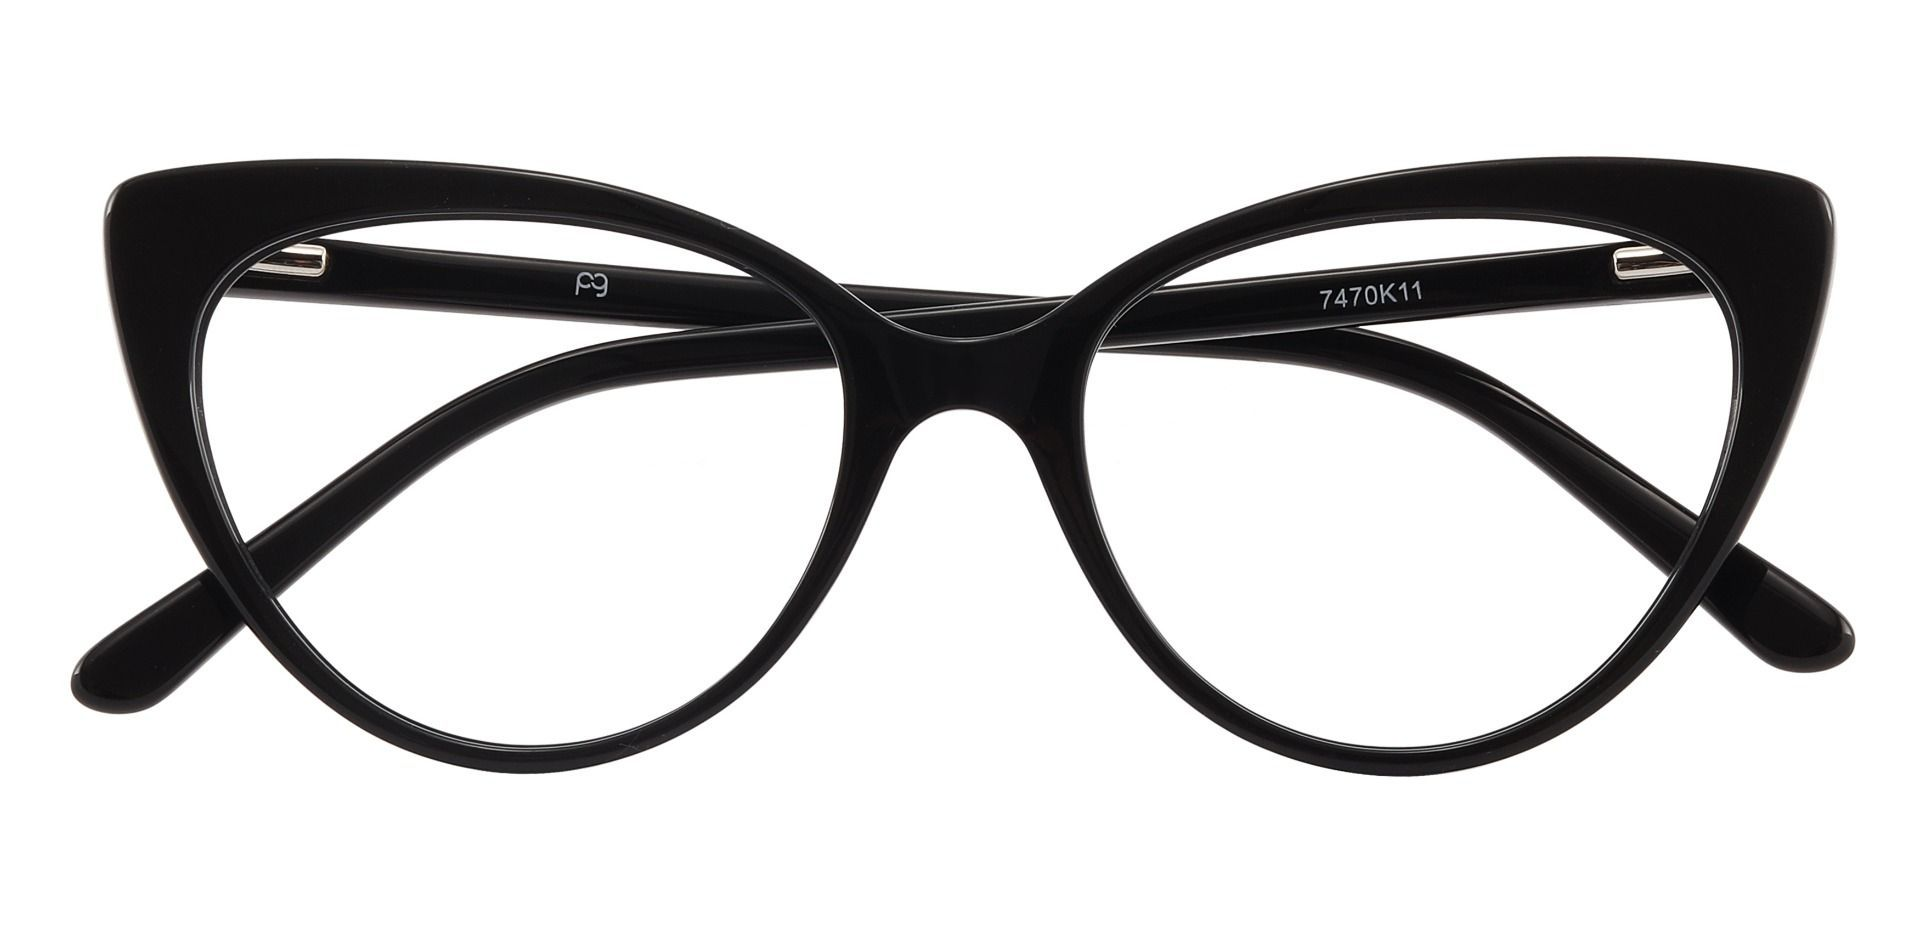 Bristol Cat Eye Prescription Glasses - Black